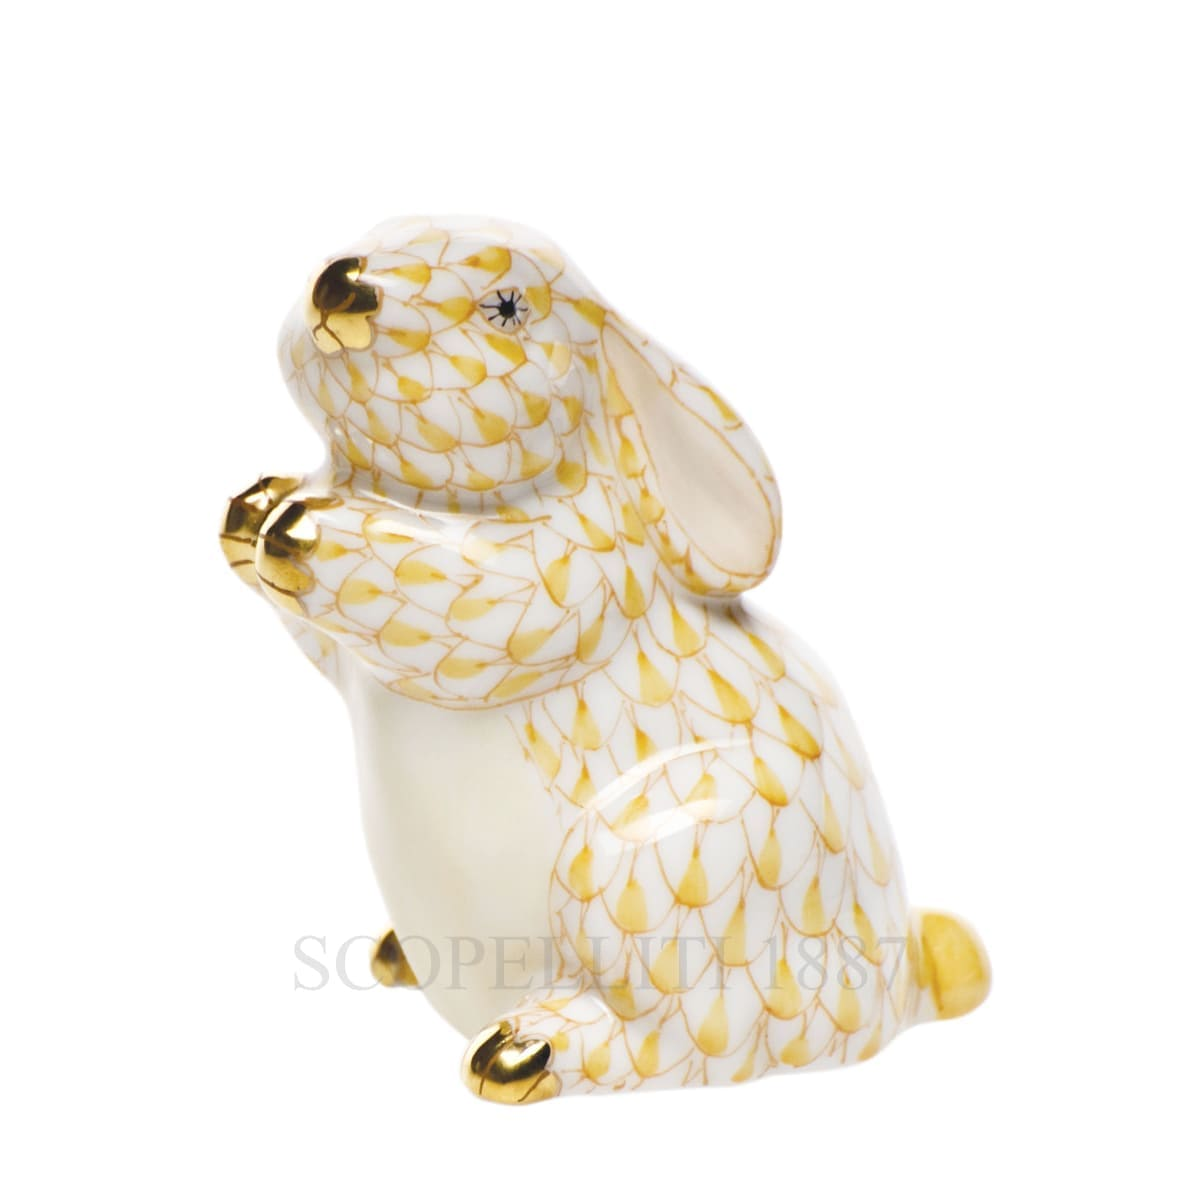 herend porcelain bunny figurine golden